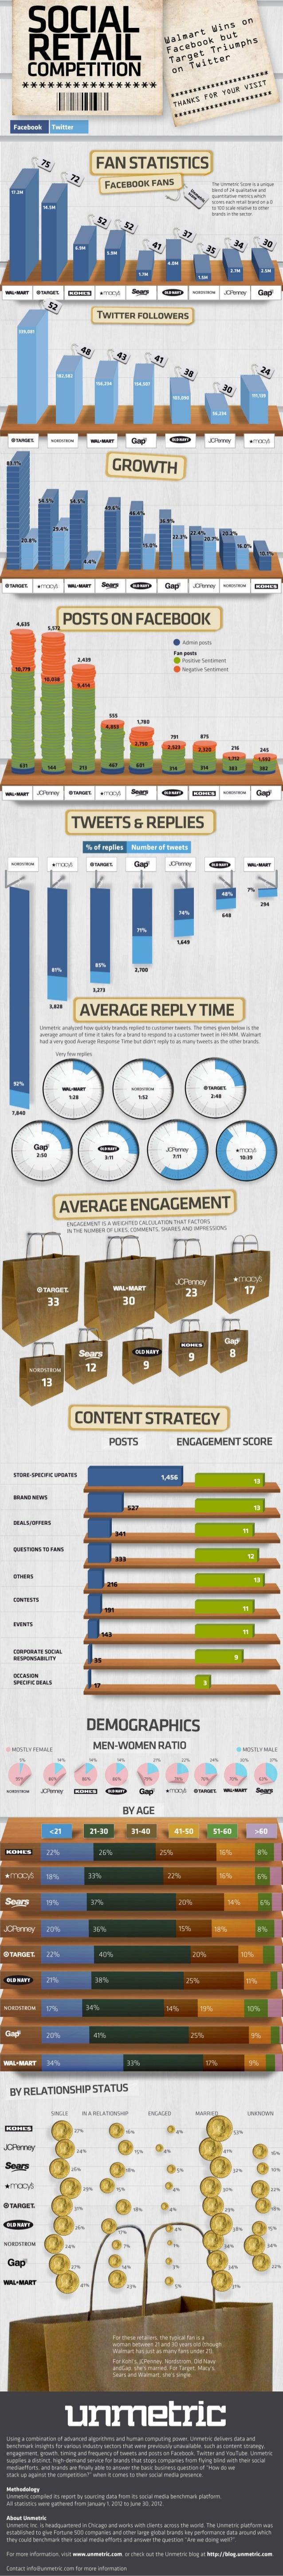 Retails brands on top of Social Media